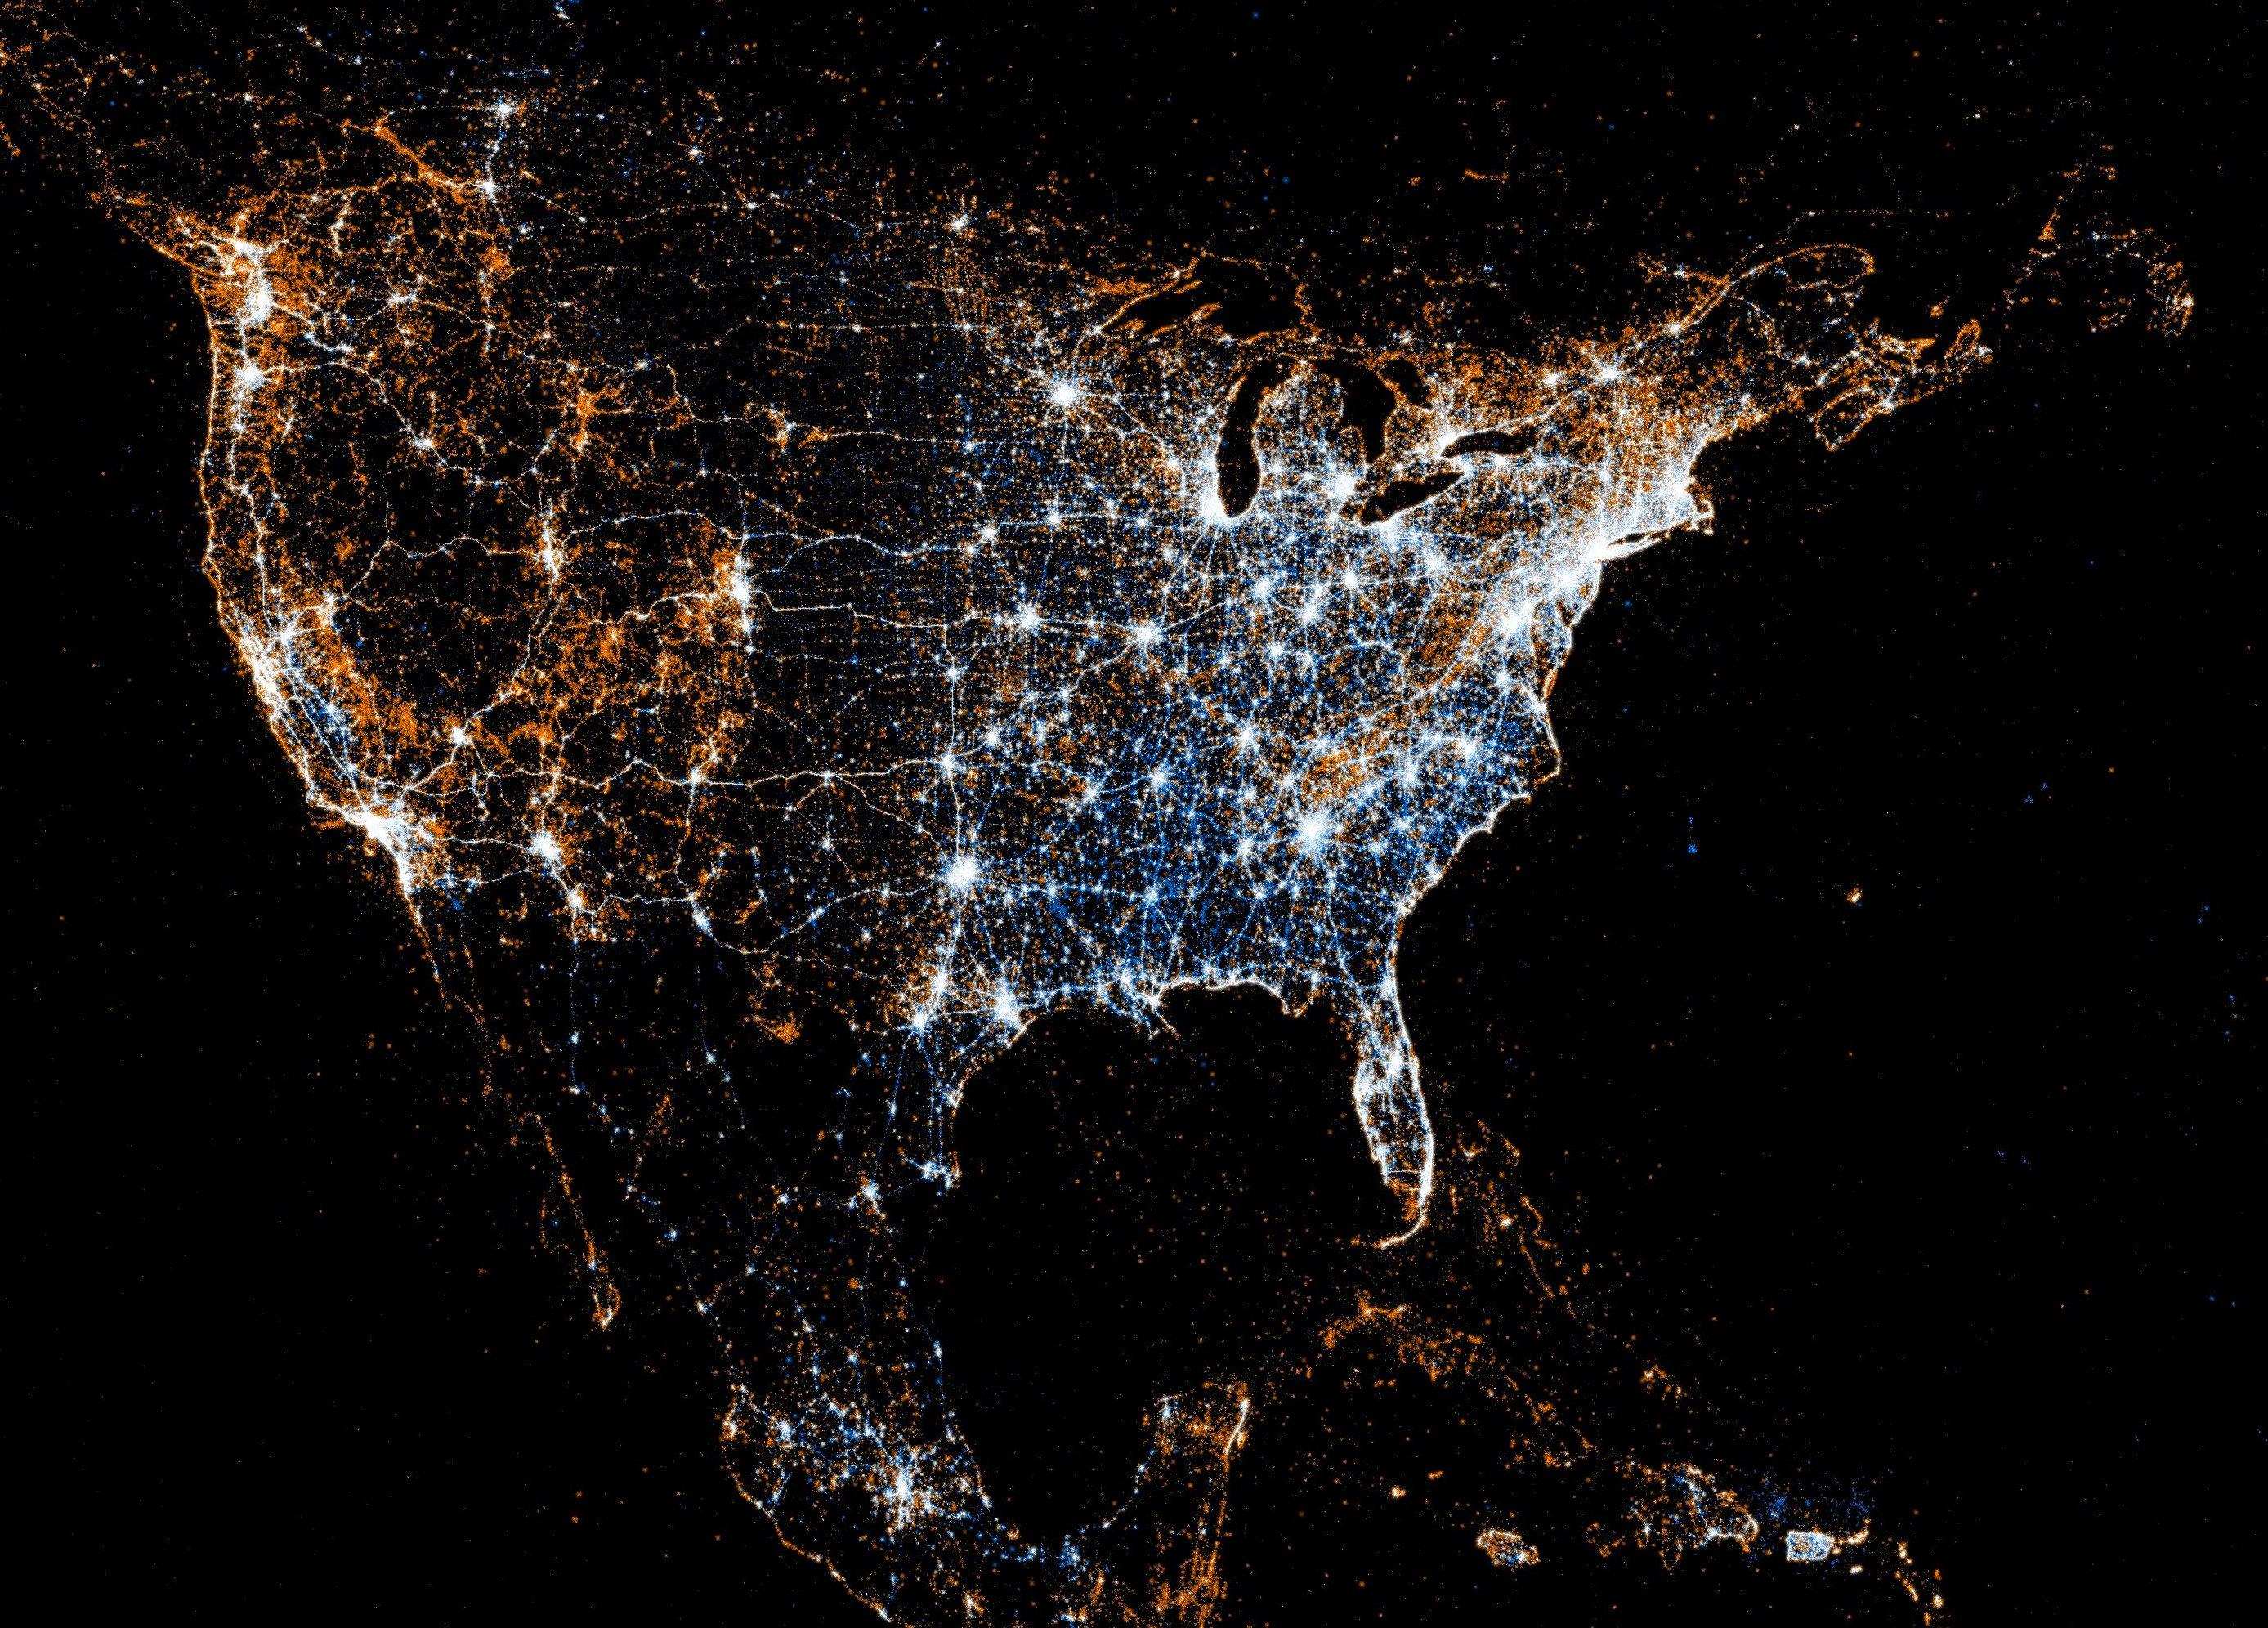 nasa night lights - HD2775×1992